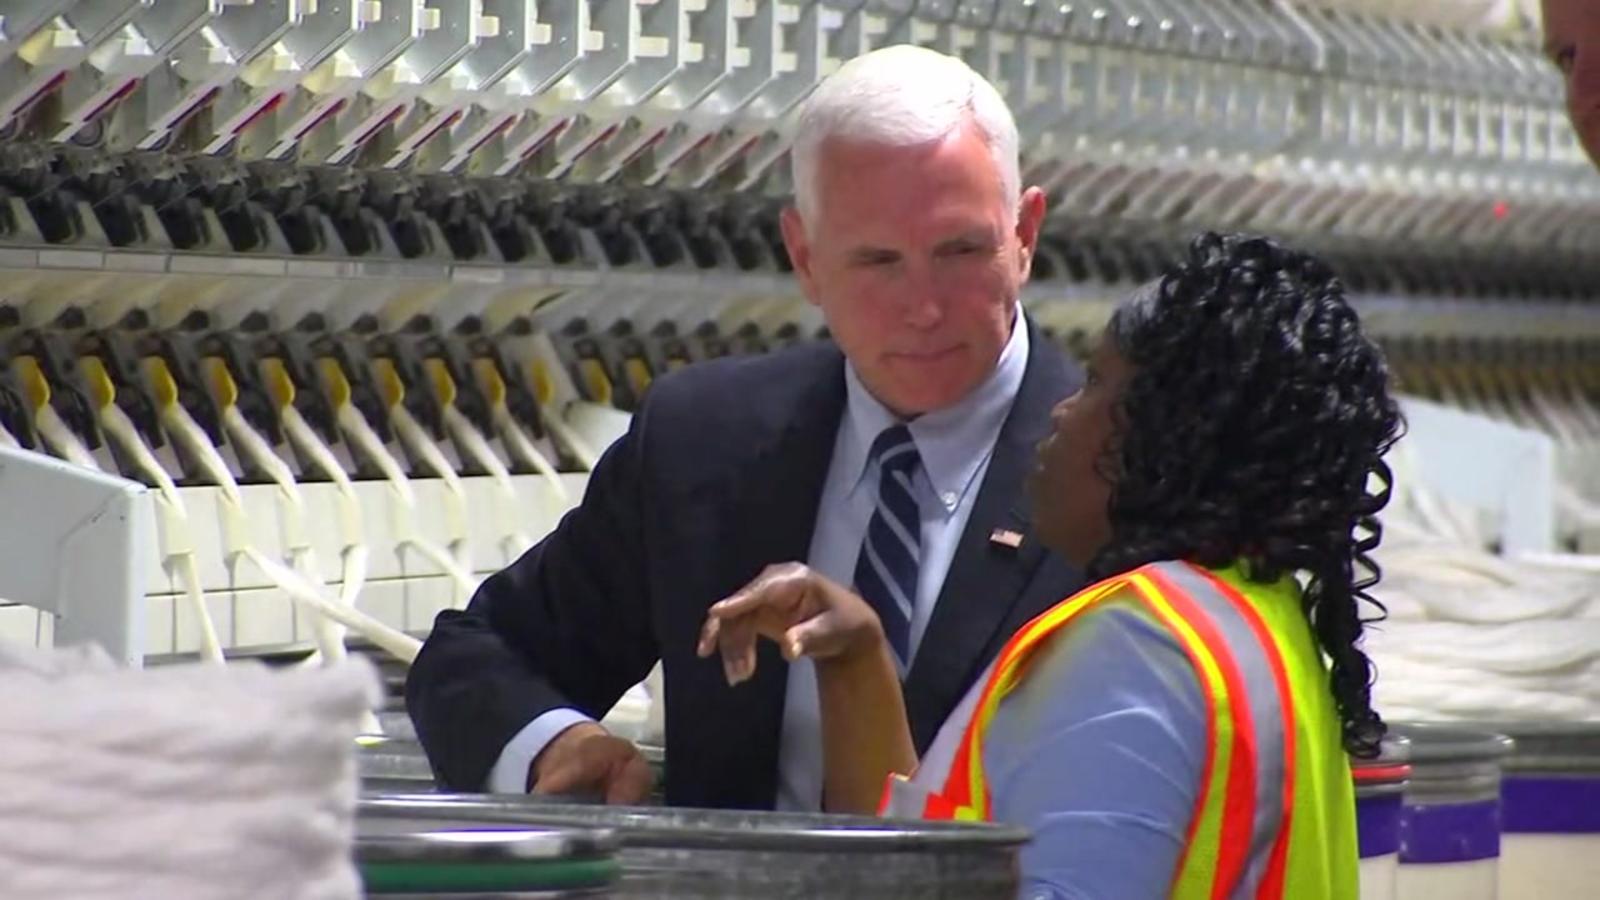 Vice President Mike Pence visits North Carolina